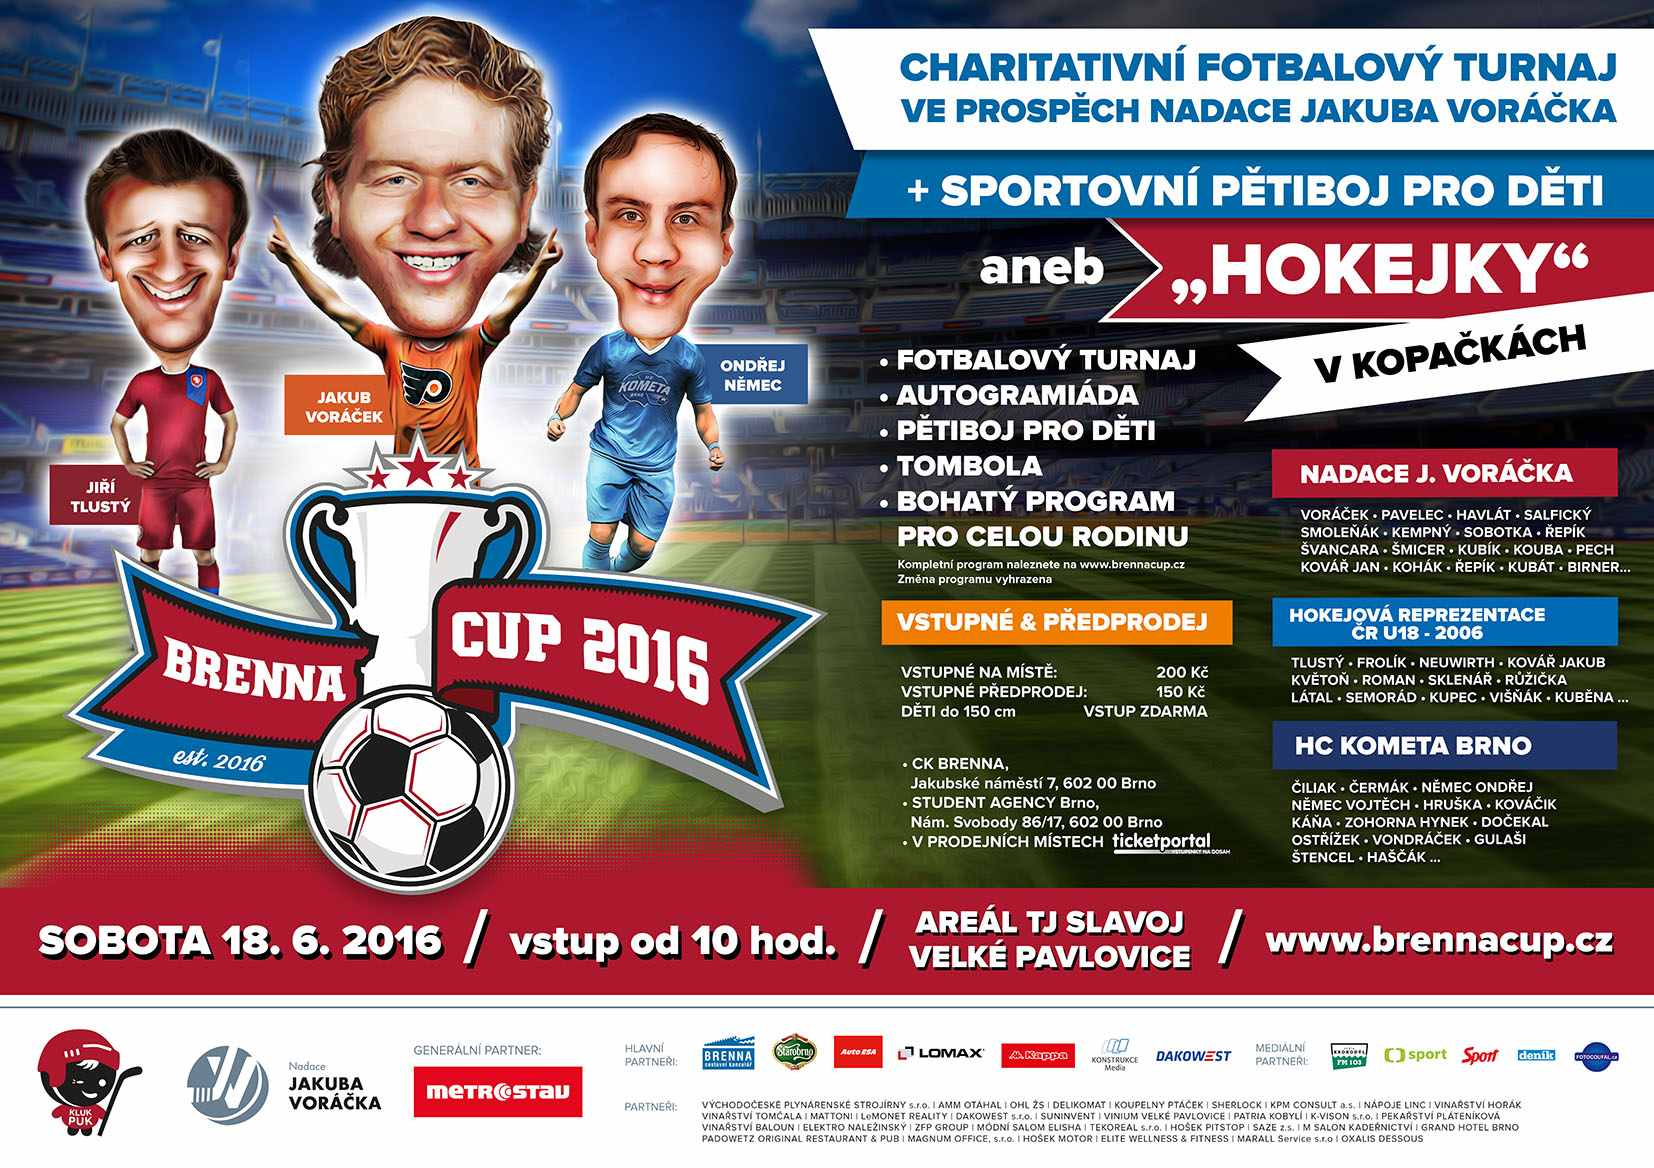 picture Brenna Cup 2016 – Charitativní fotbalový turnaj